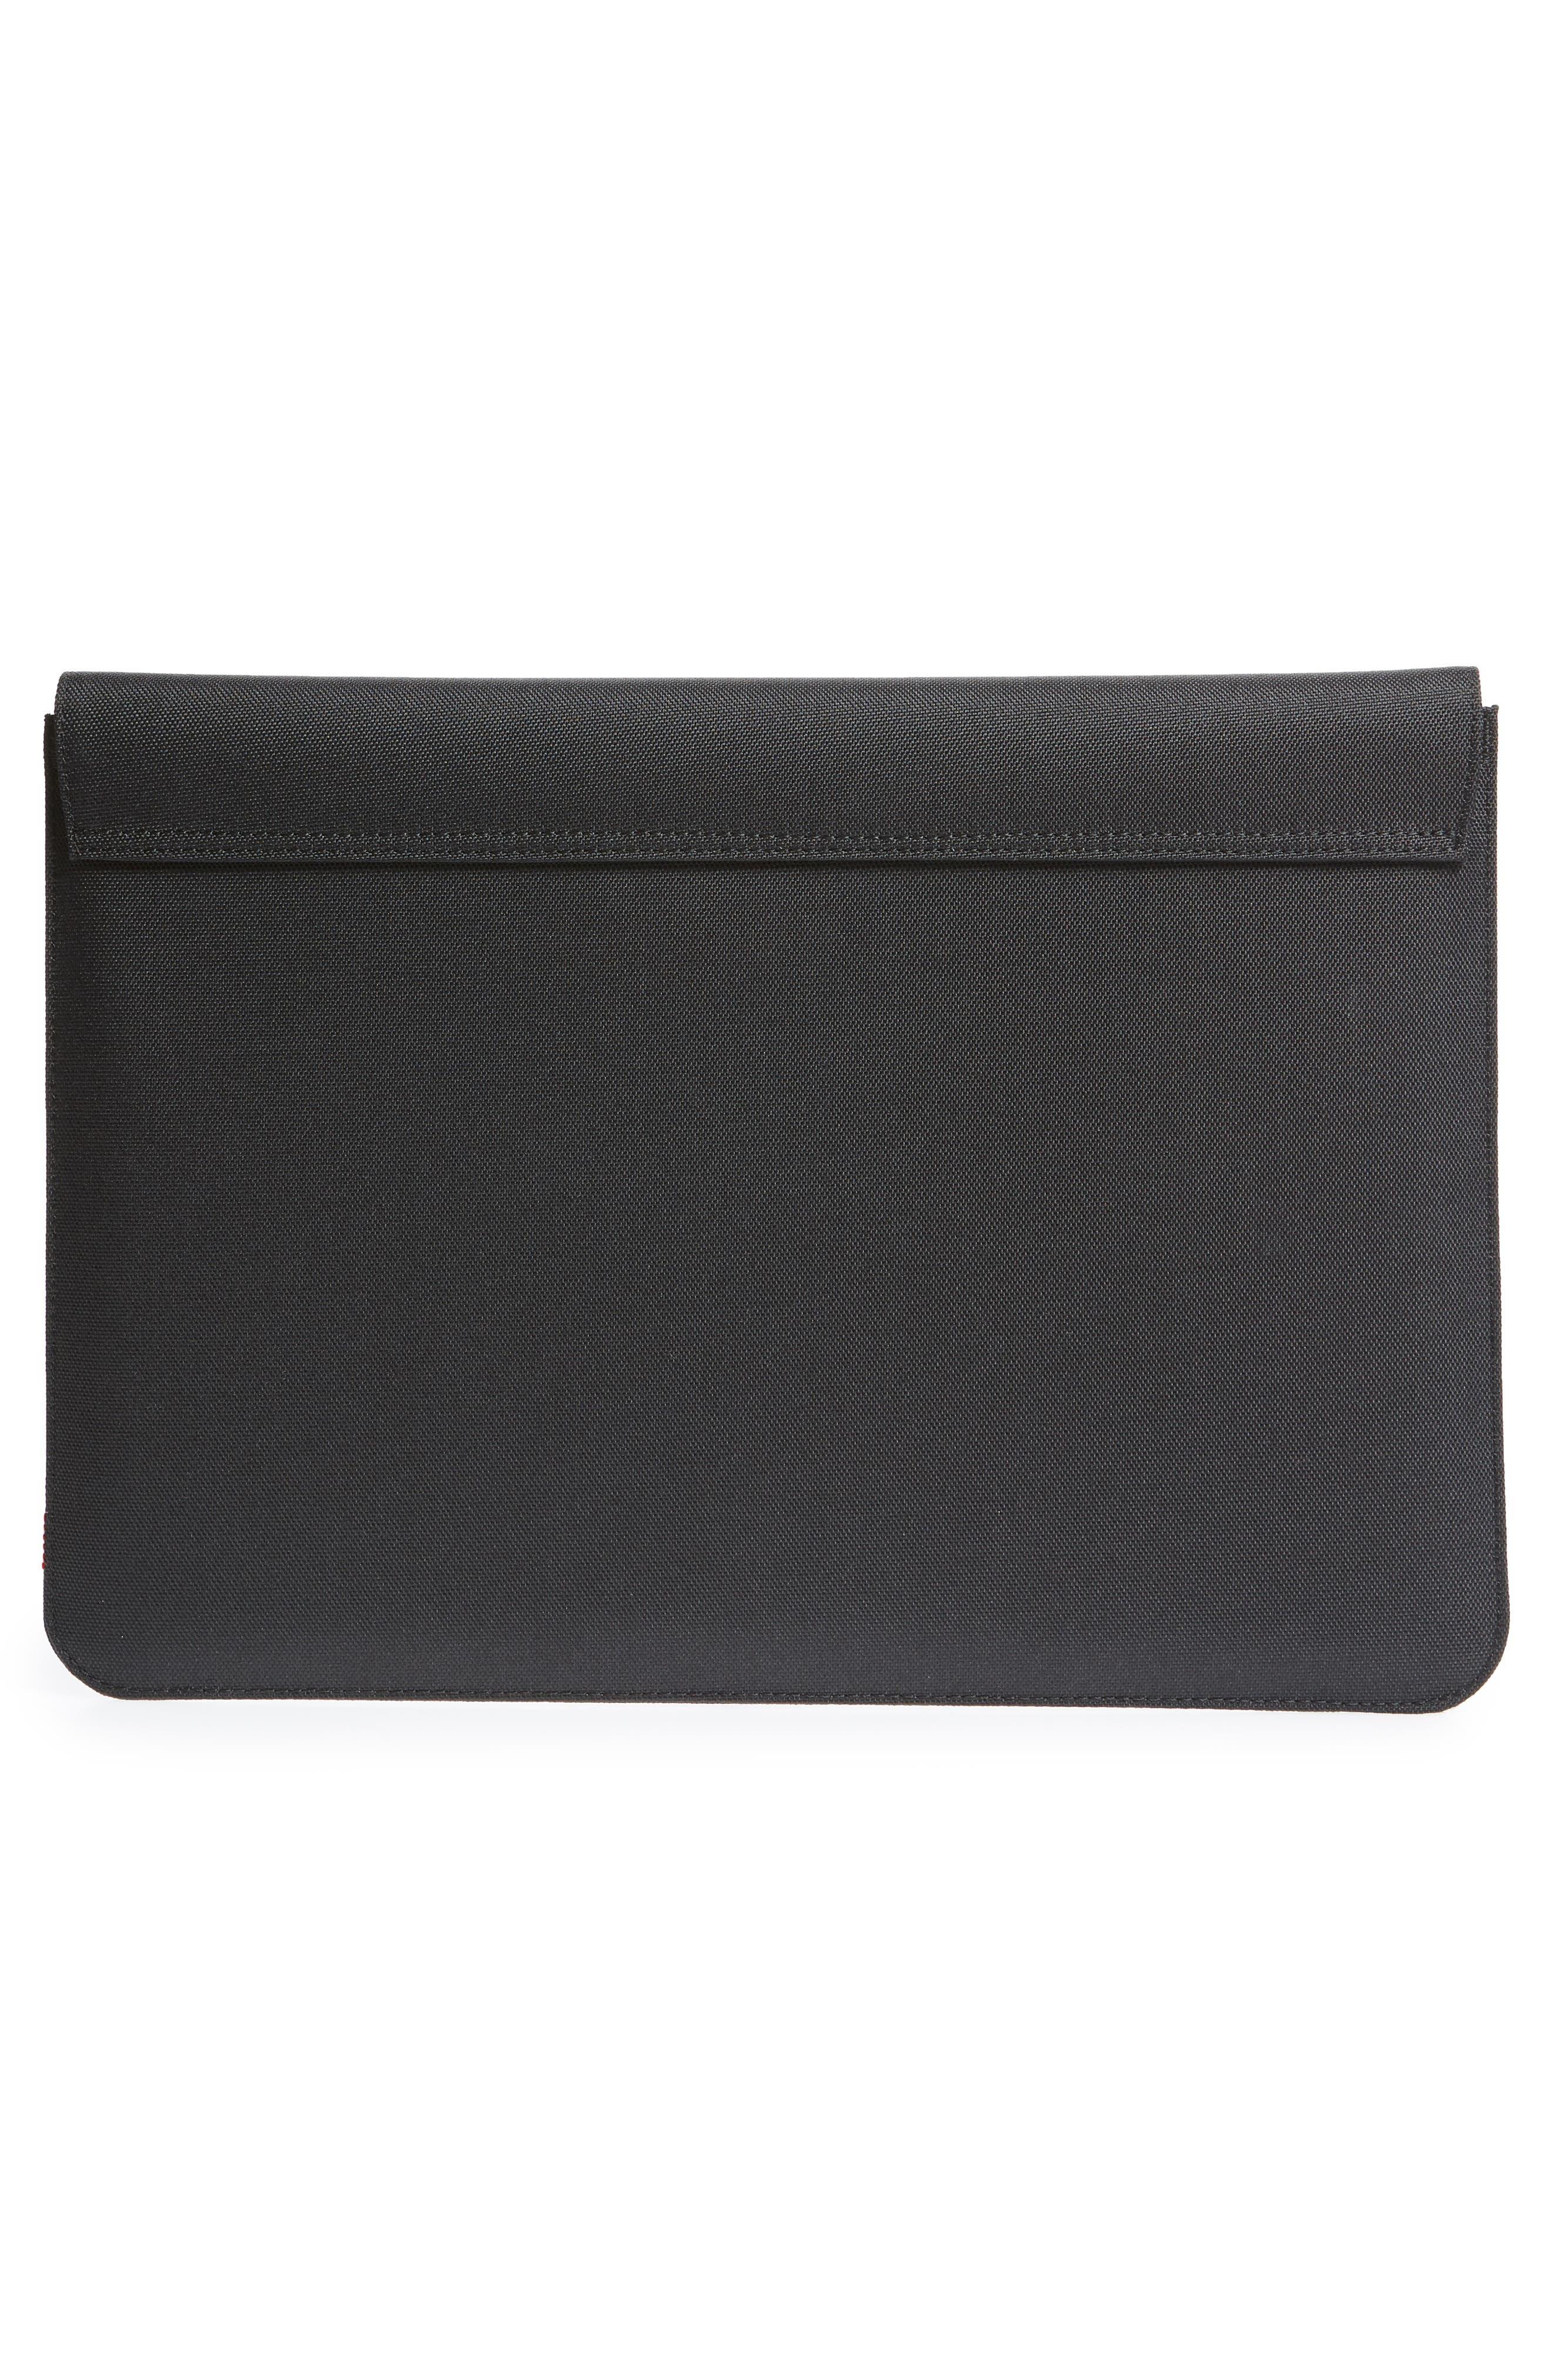 Spokane 13-Inch MacBook Canvas Sleeve,                             Alternate thumbnail 4, color,                             001